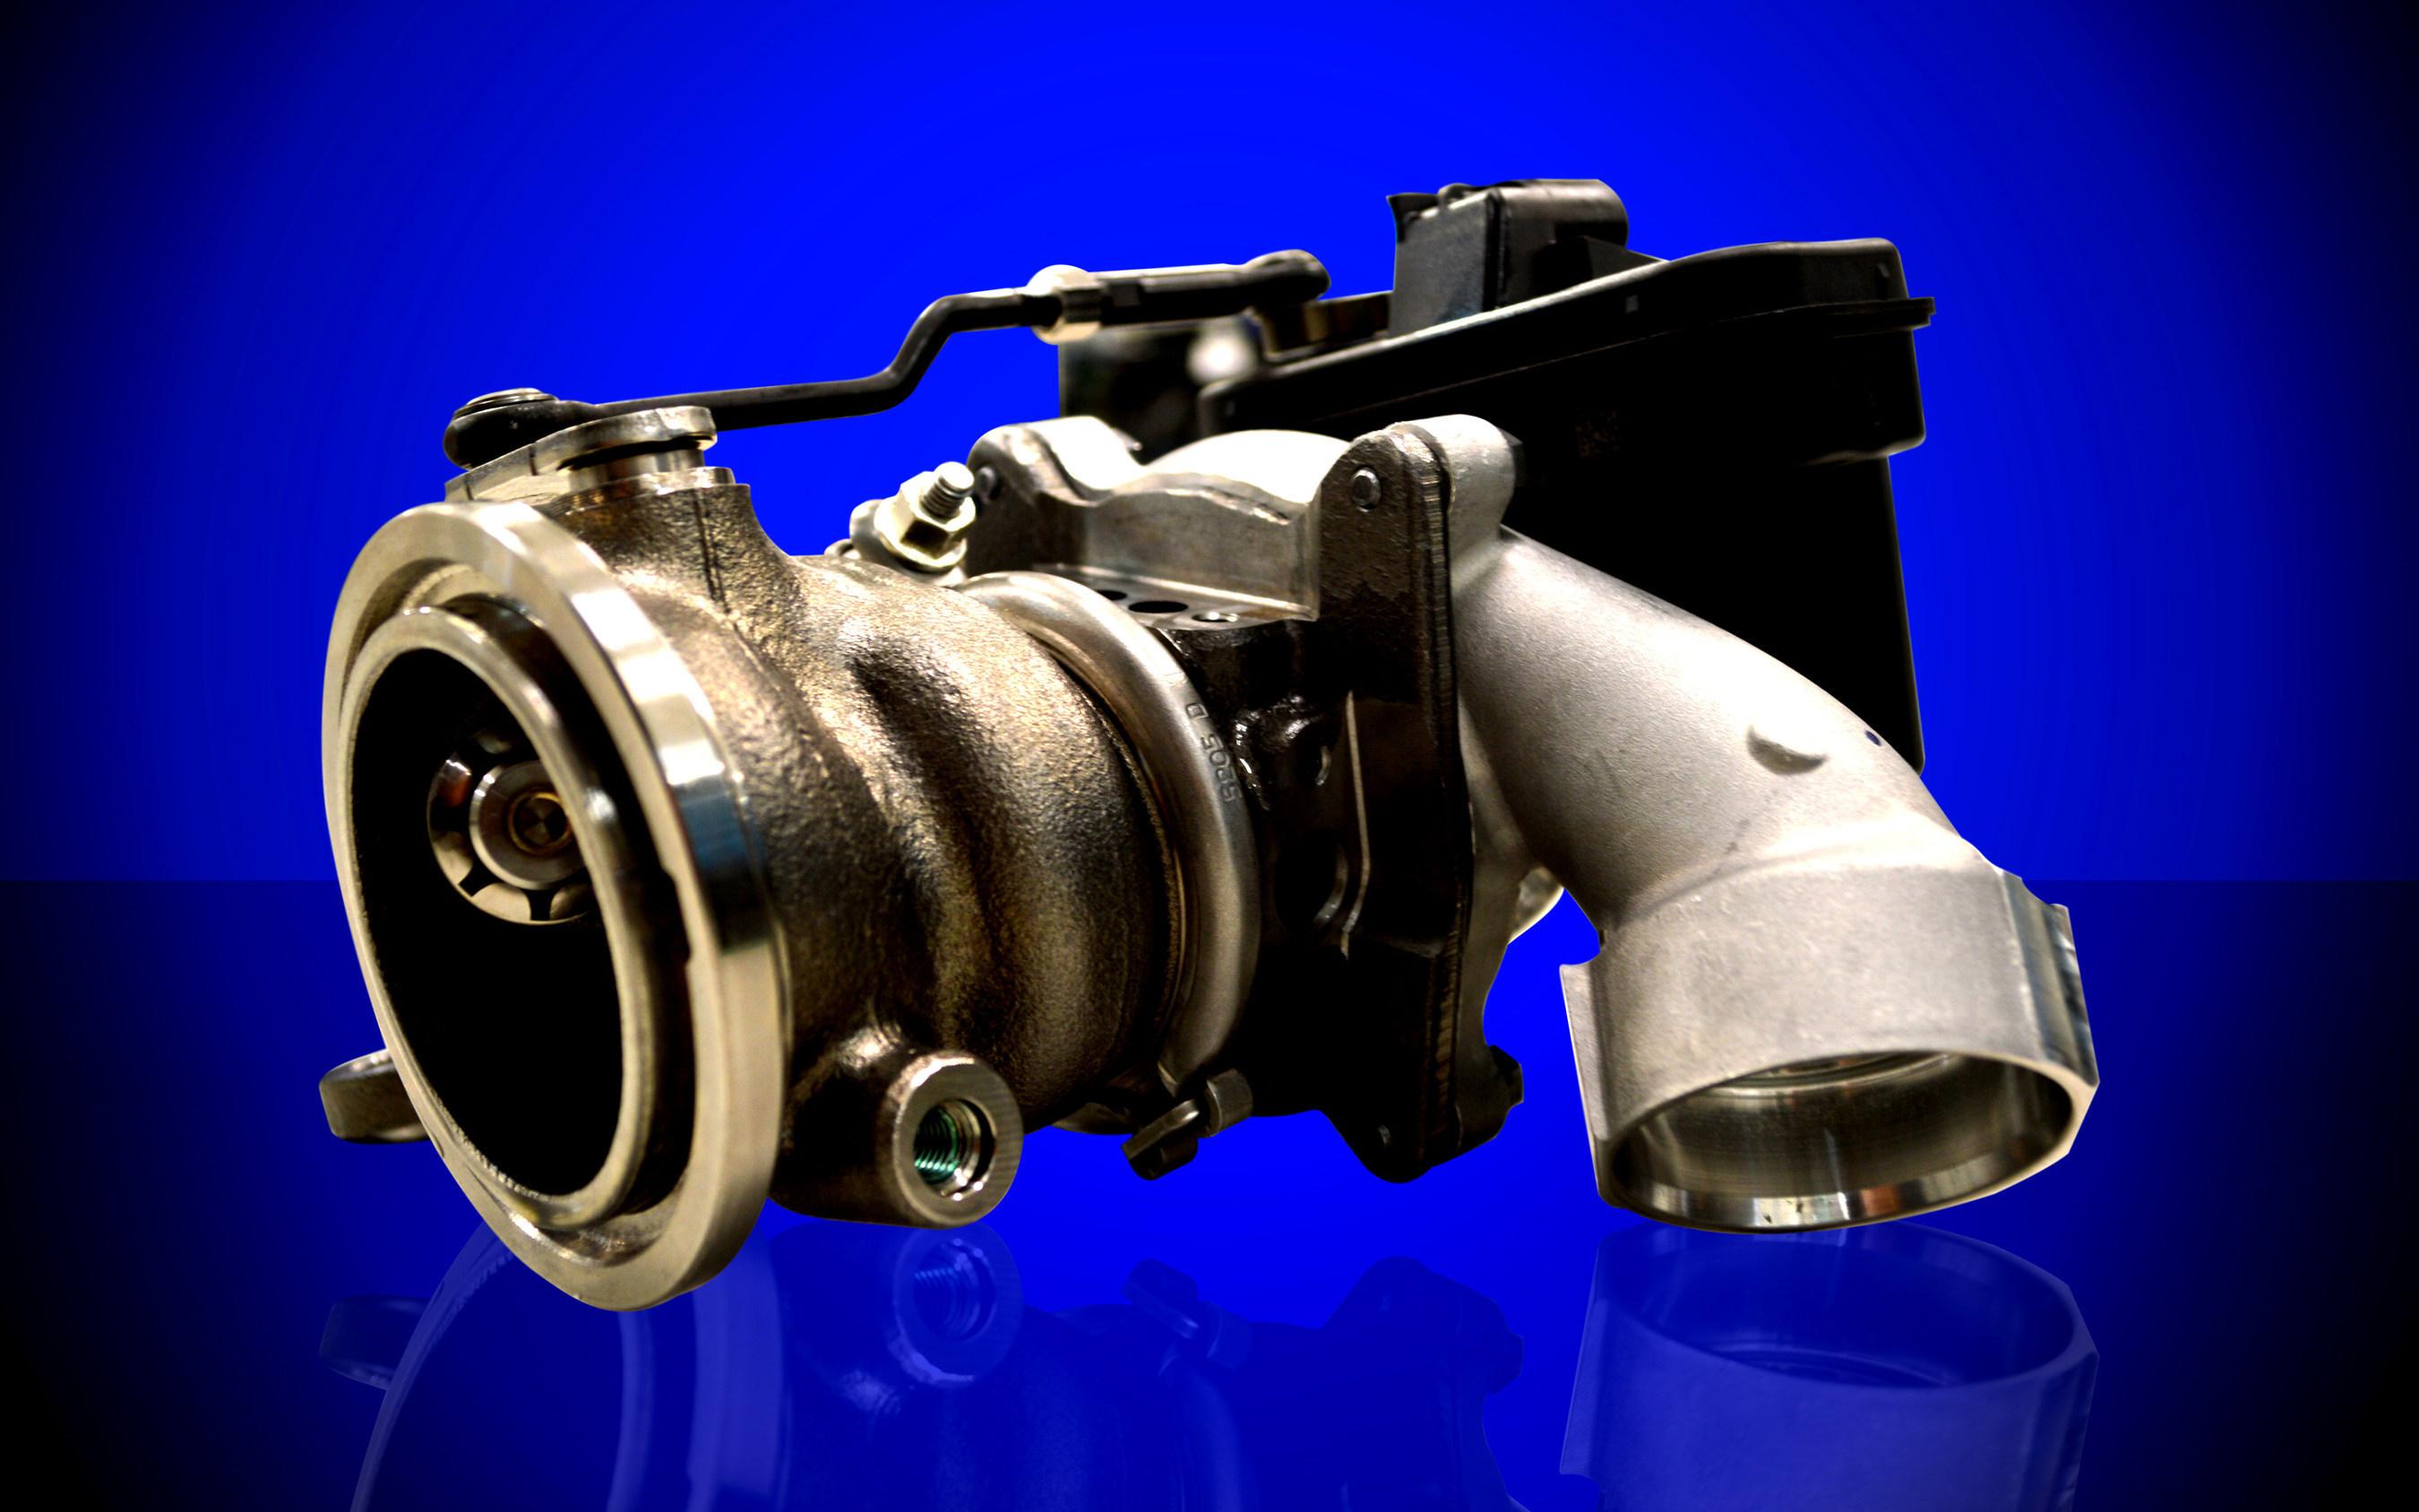 BorgWarner Inc Flex Fuel Turbocharger